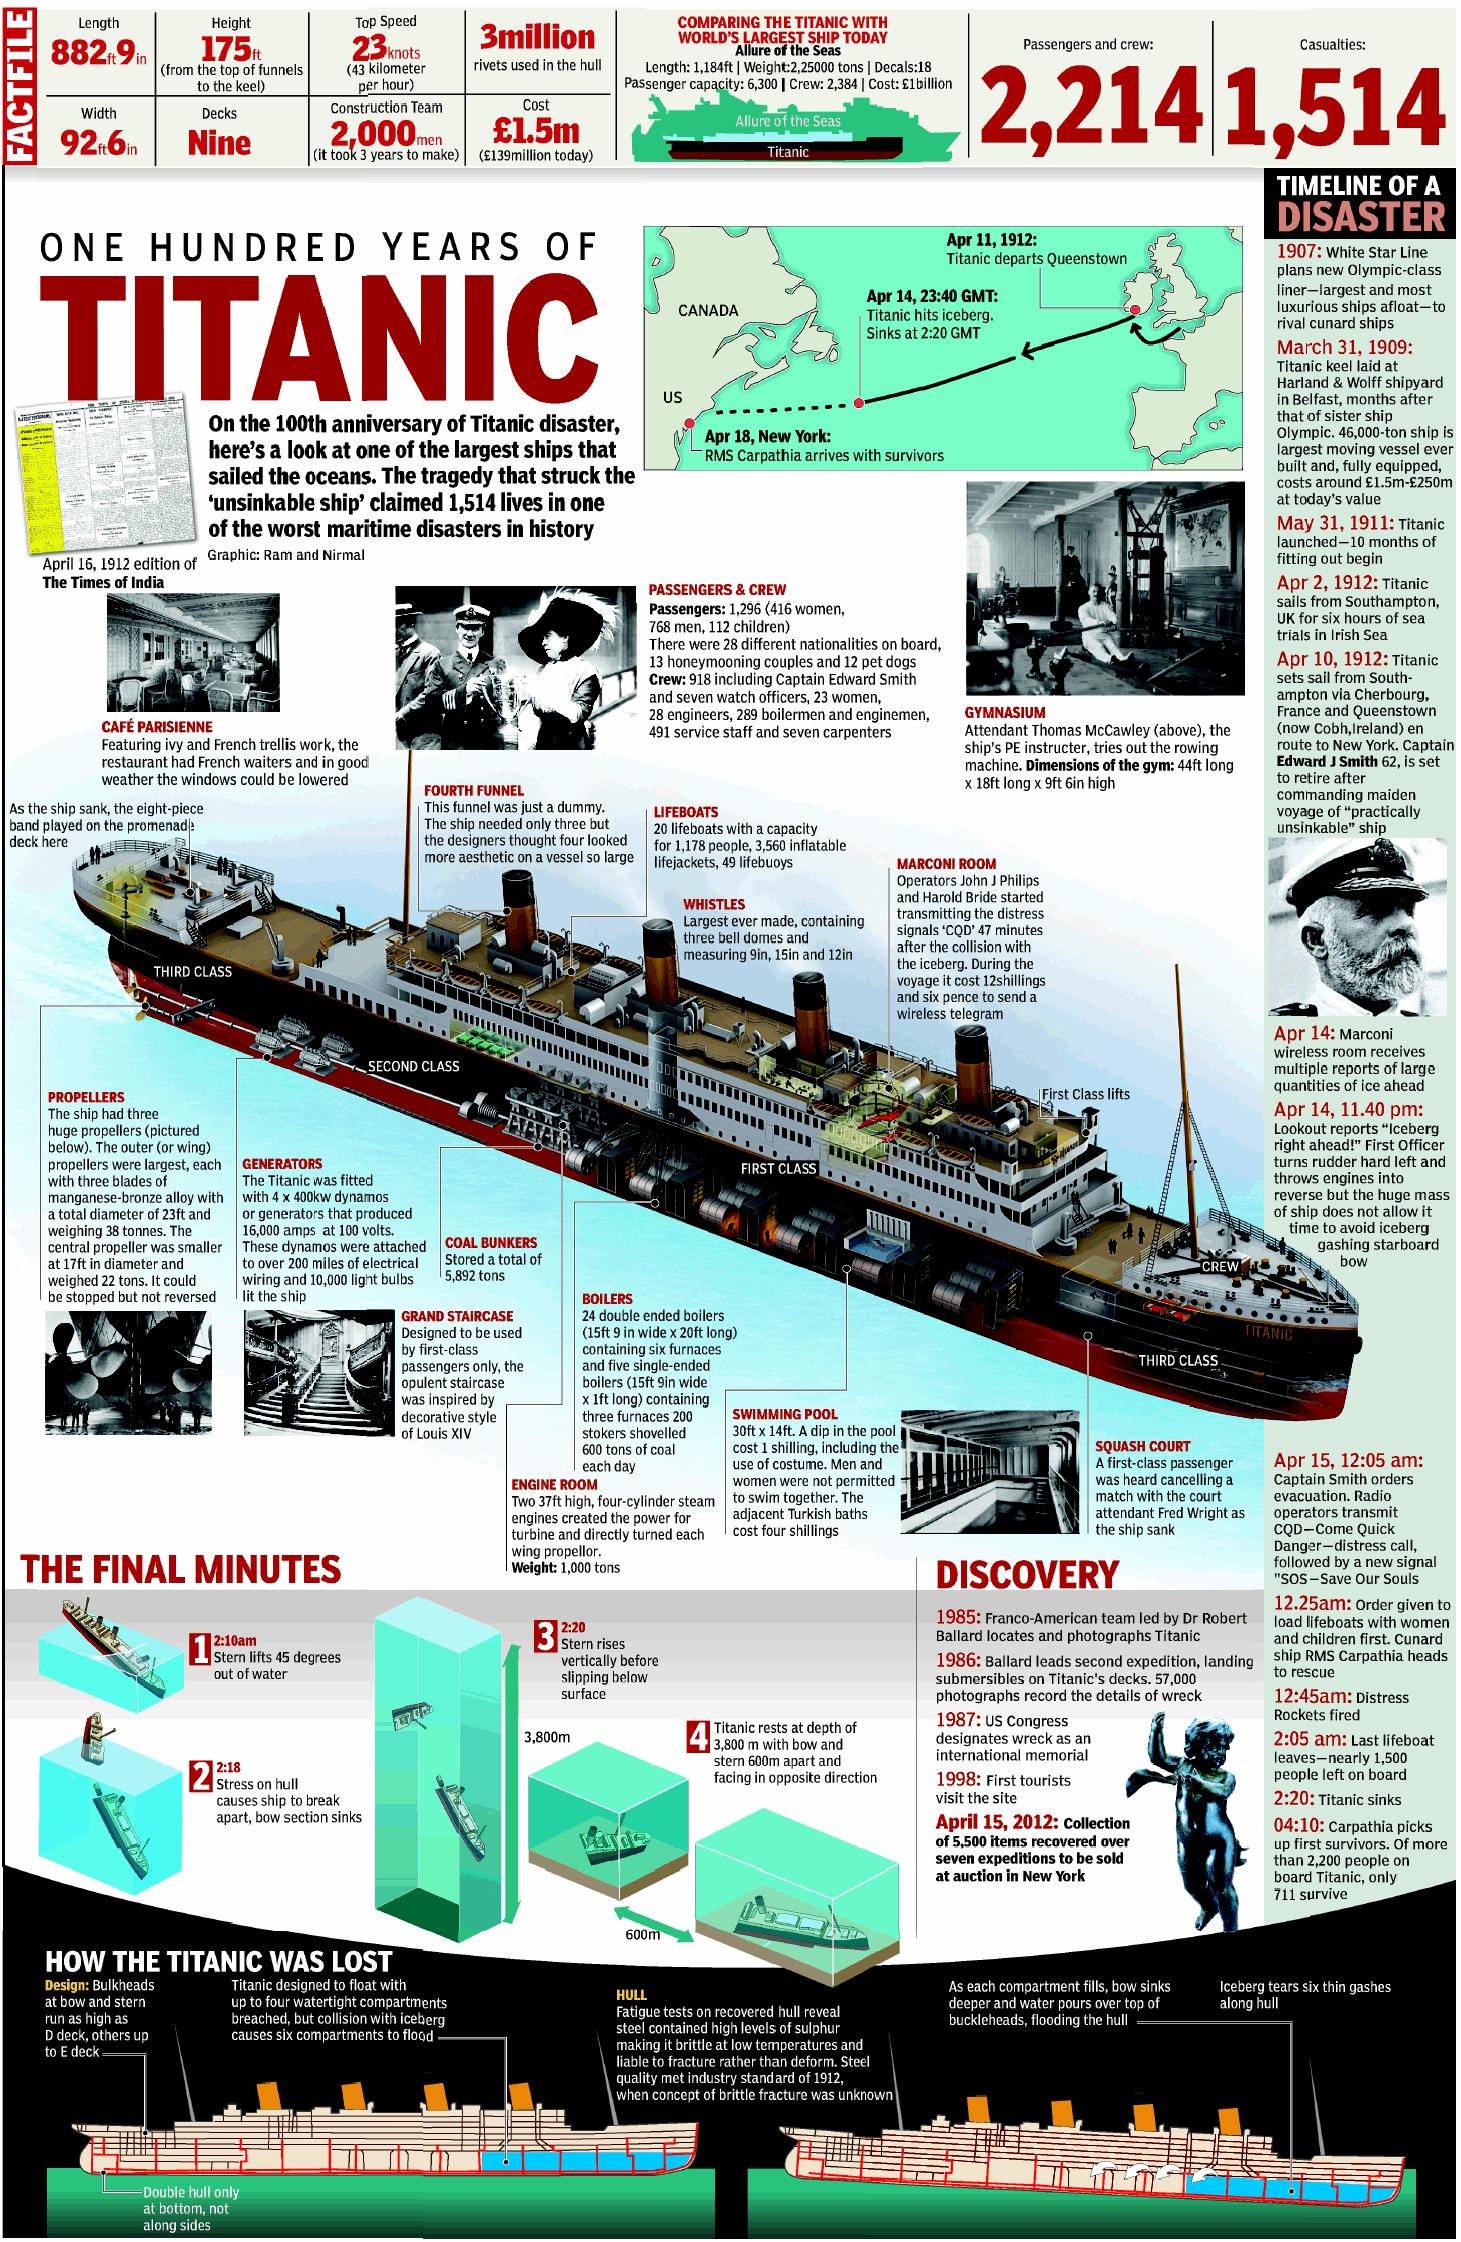 100 Years Of Titanic Loss